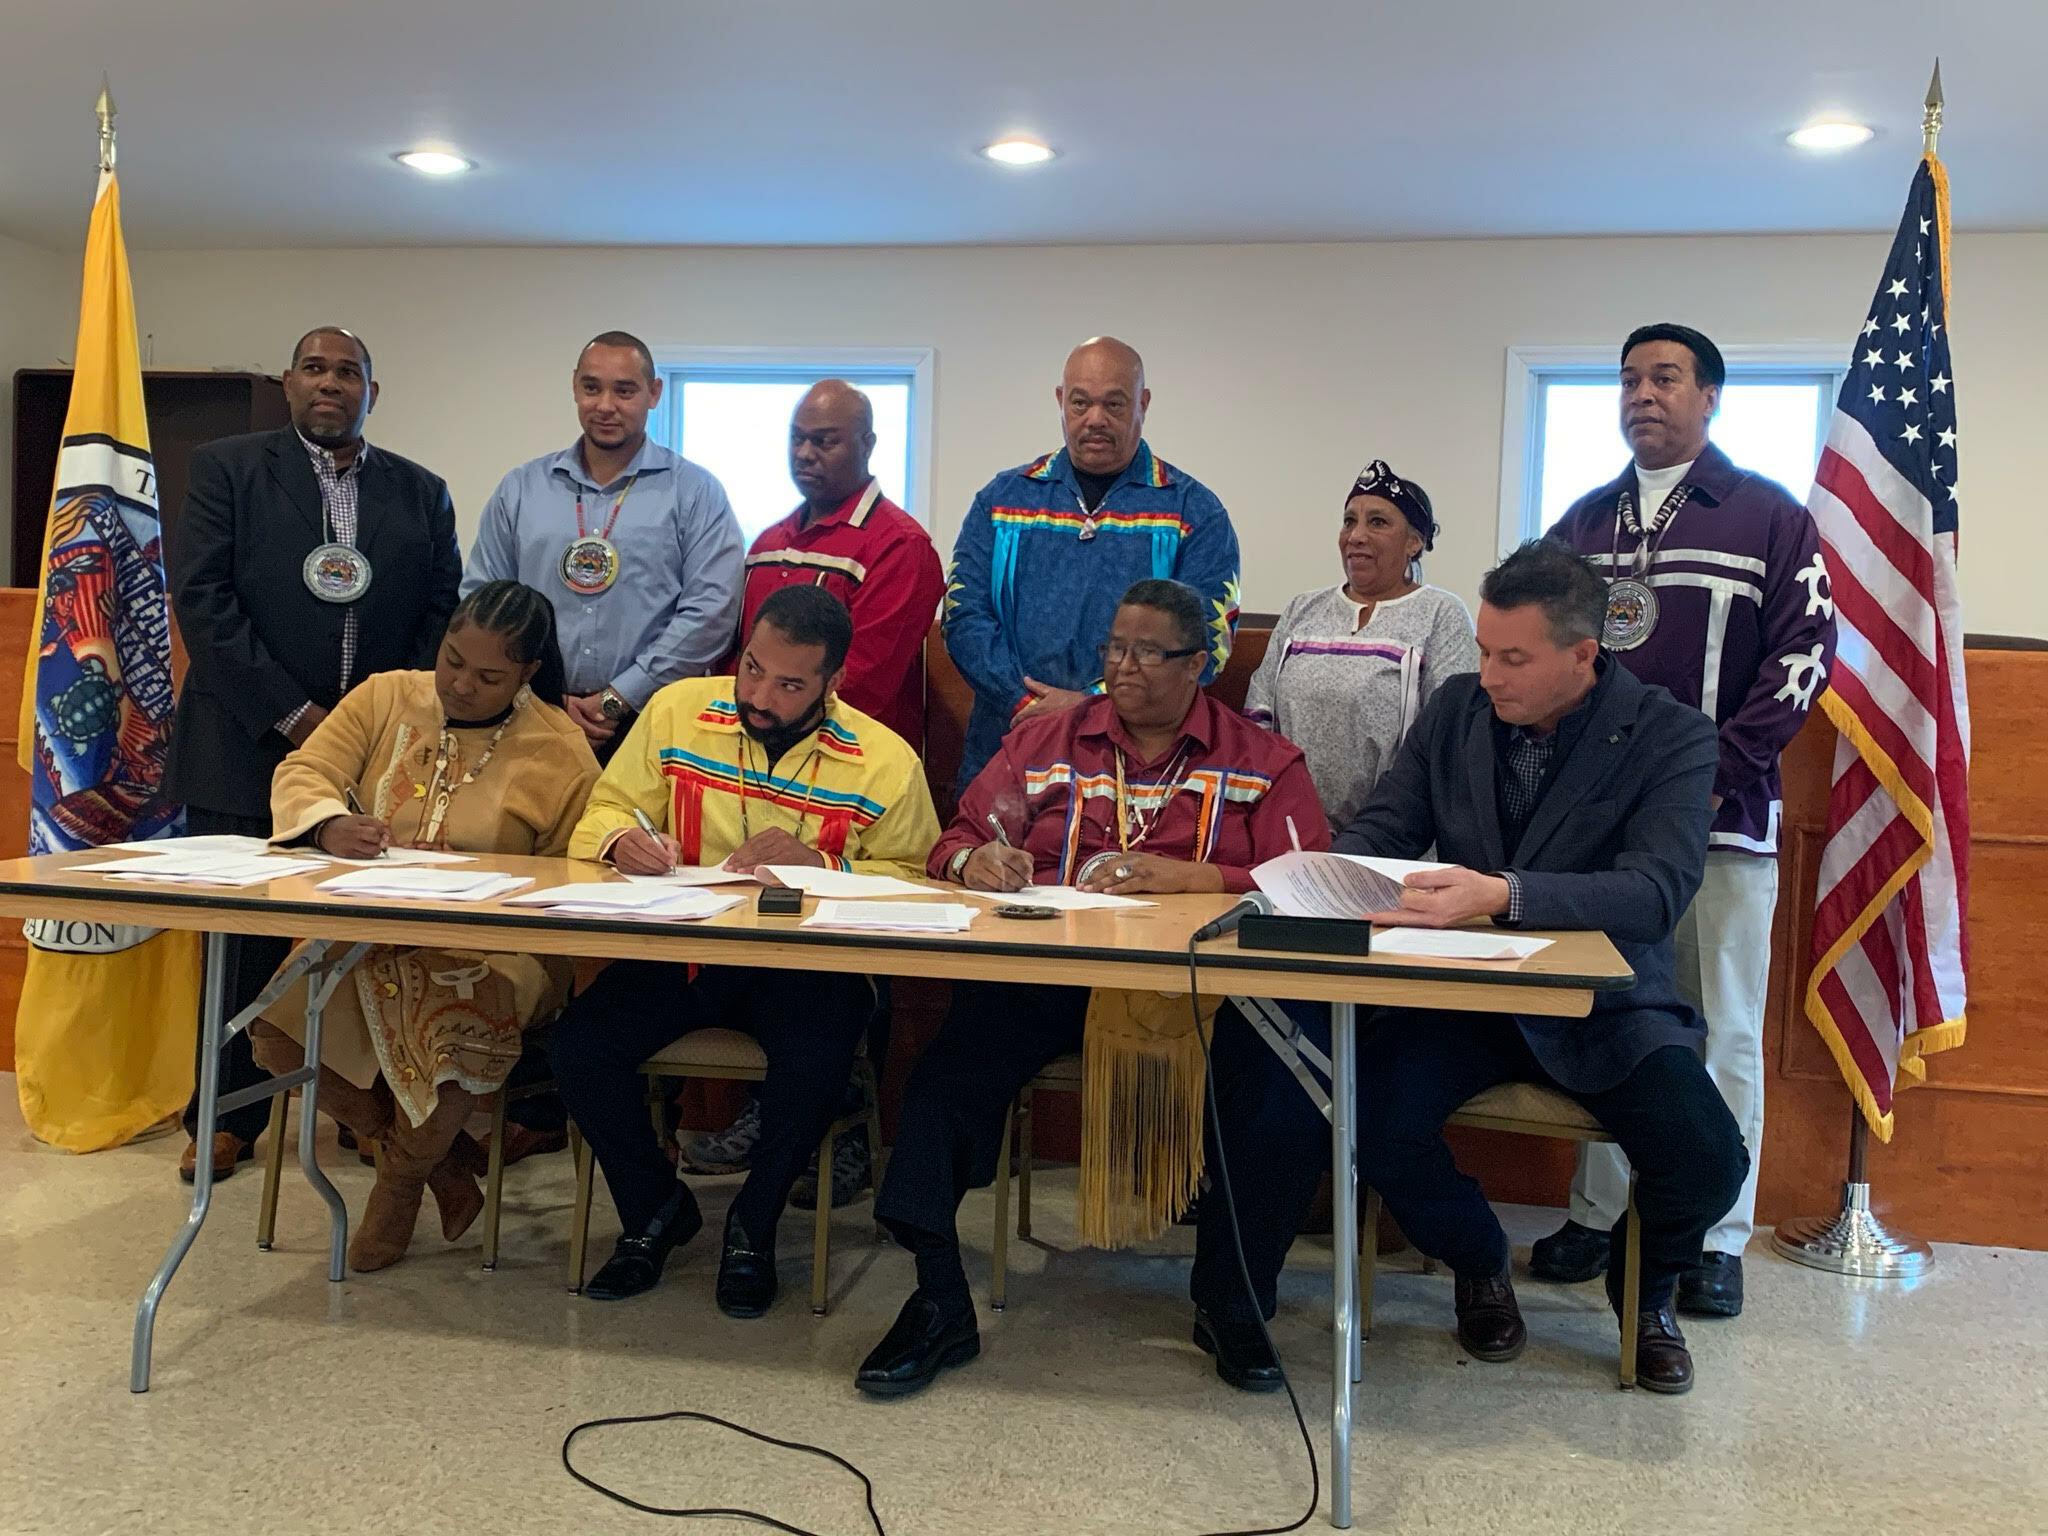 Barre Hamp, Seneca Bowen, Germain Smith, Daniel Collins Sr., Linda Franklin, Lance Gumbs, Chenea Bullock, Bryan Polite, Donald Williams, Jr., Todd J. Bergeron at the signing ceremony.